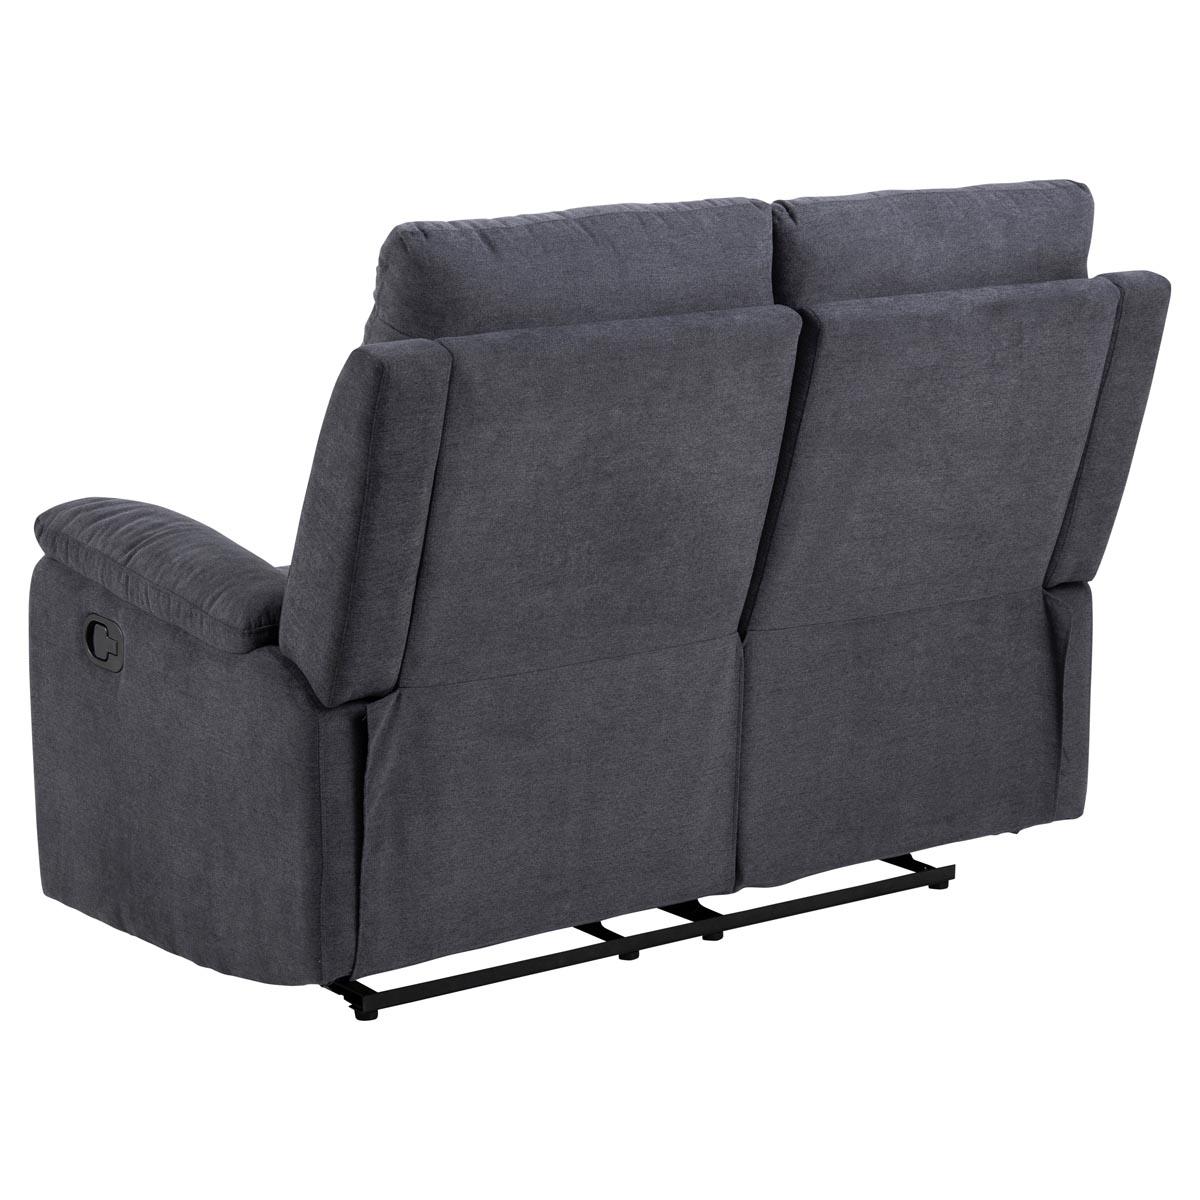 Smogen-2sits-recliner-rygg